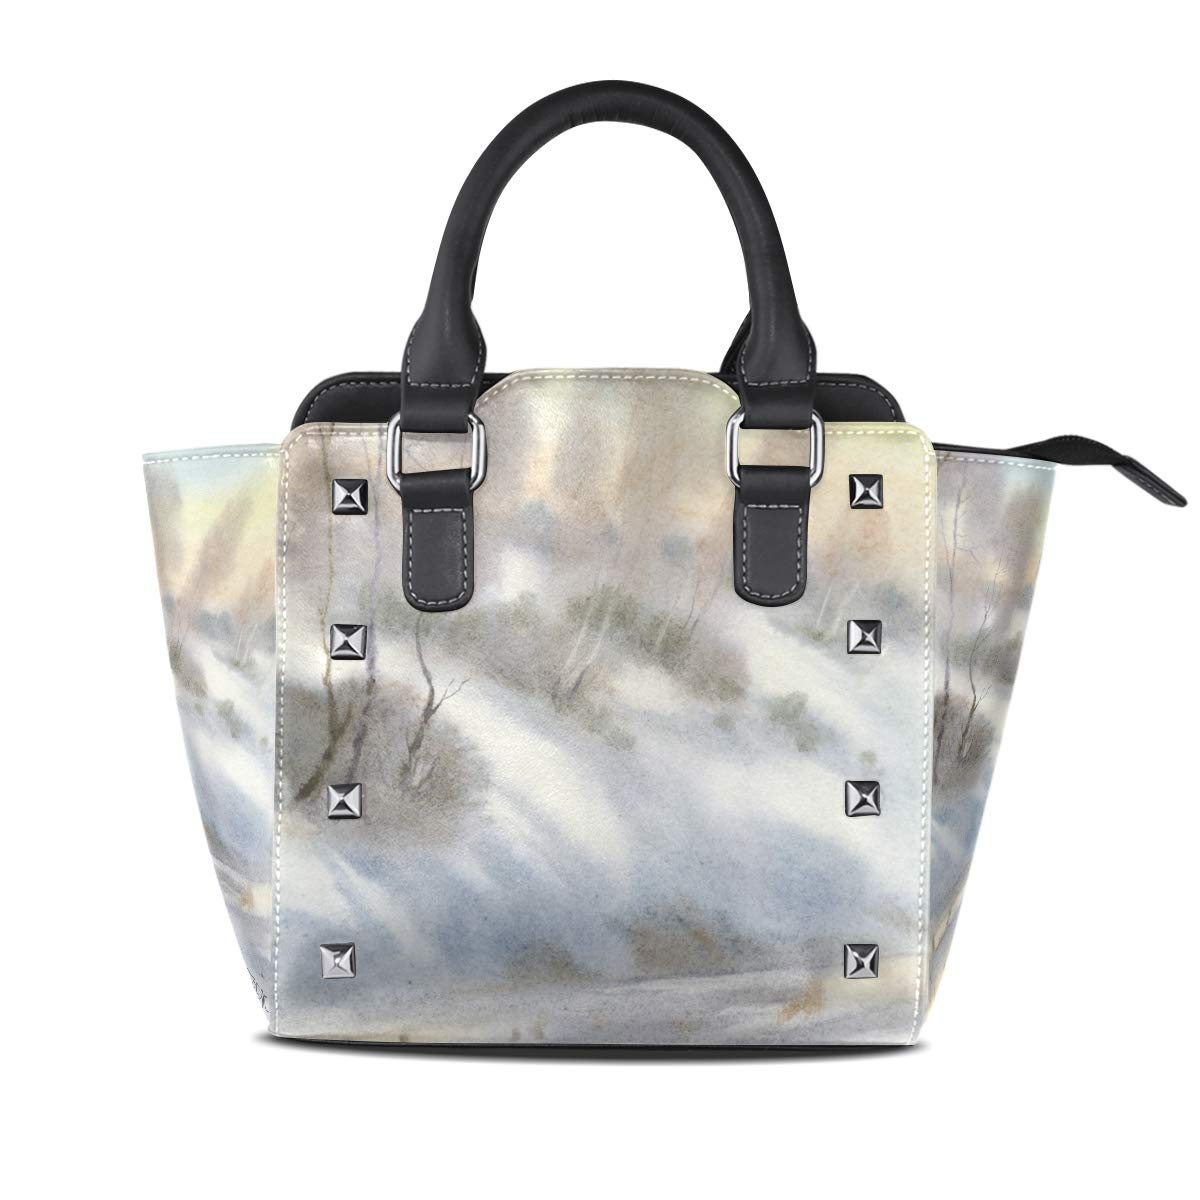 Design4 Handbag Elephant And Balloon Genuine Leather Tote Rivet Bag Shoulder Strap Top Handle Women